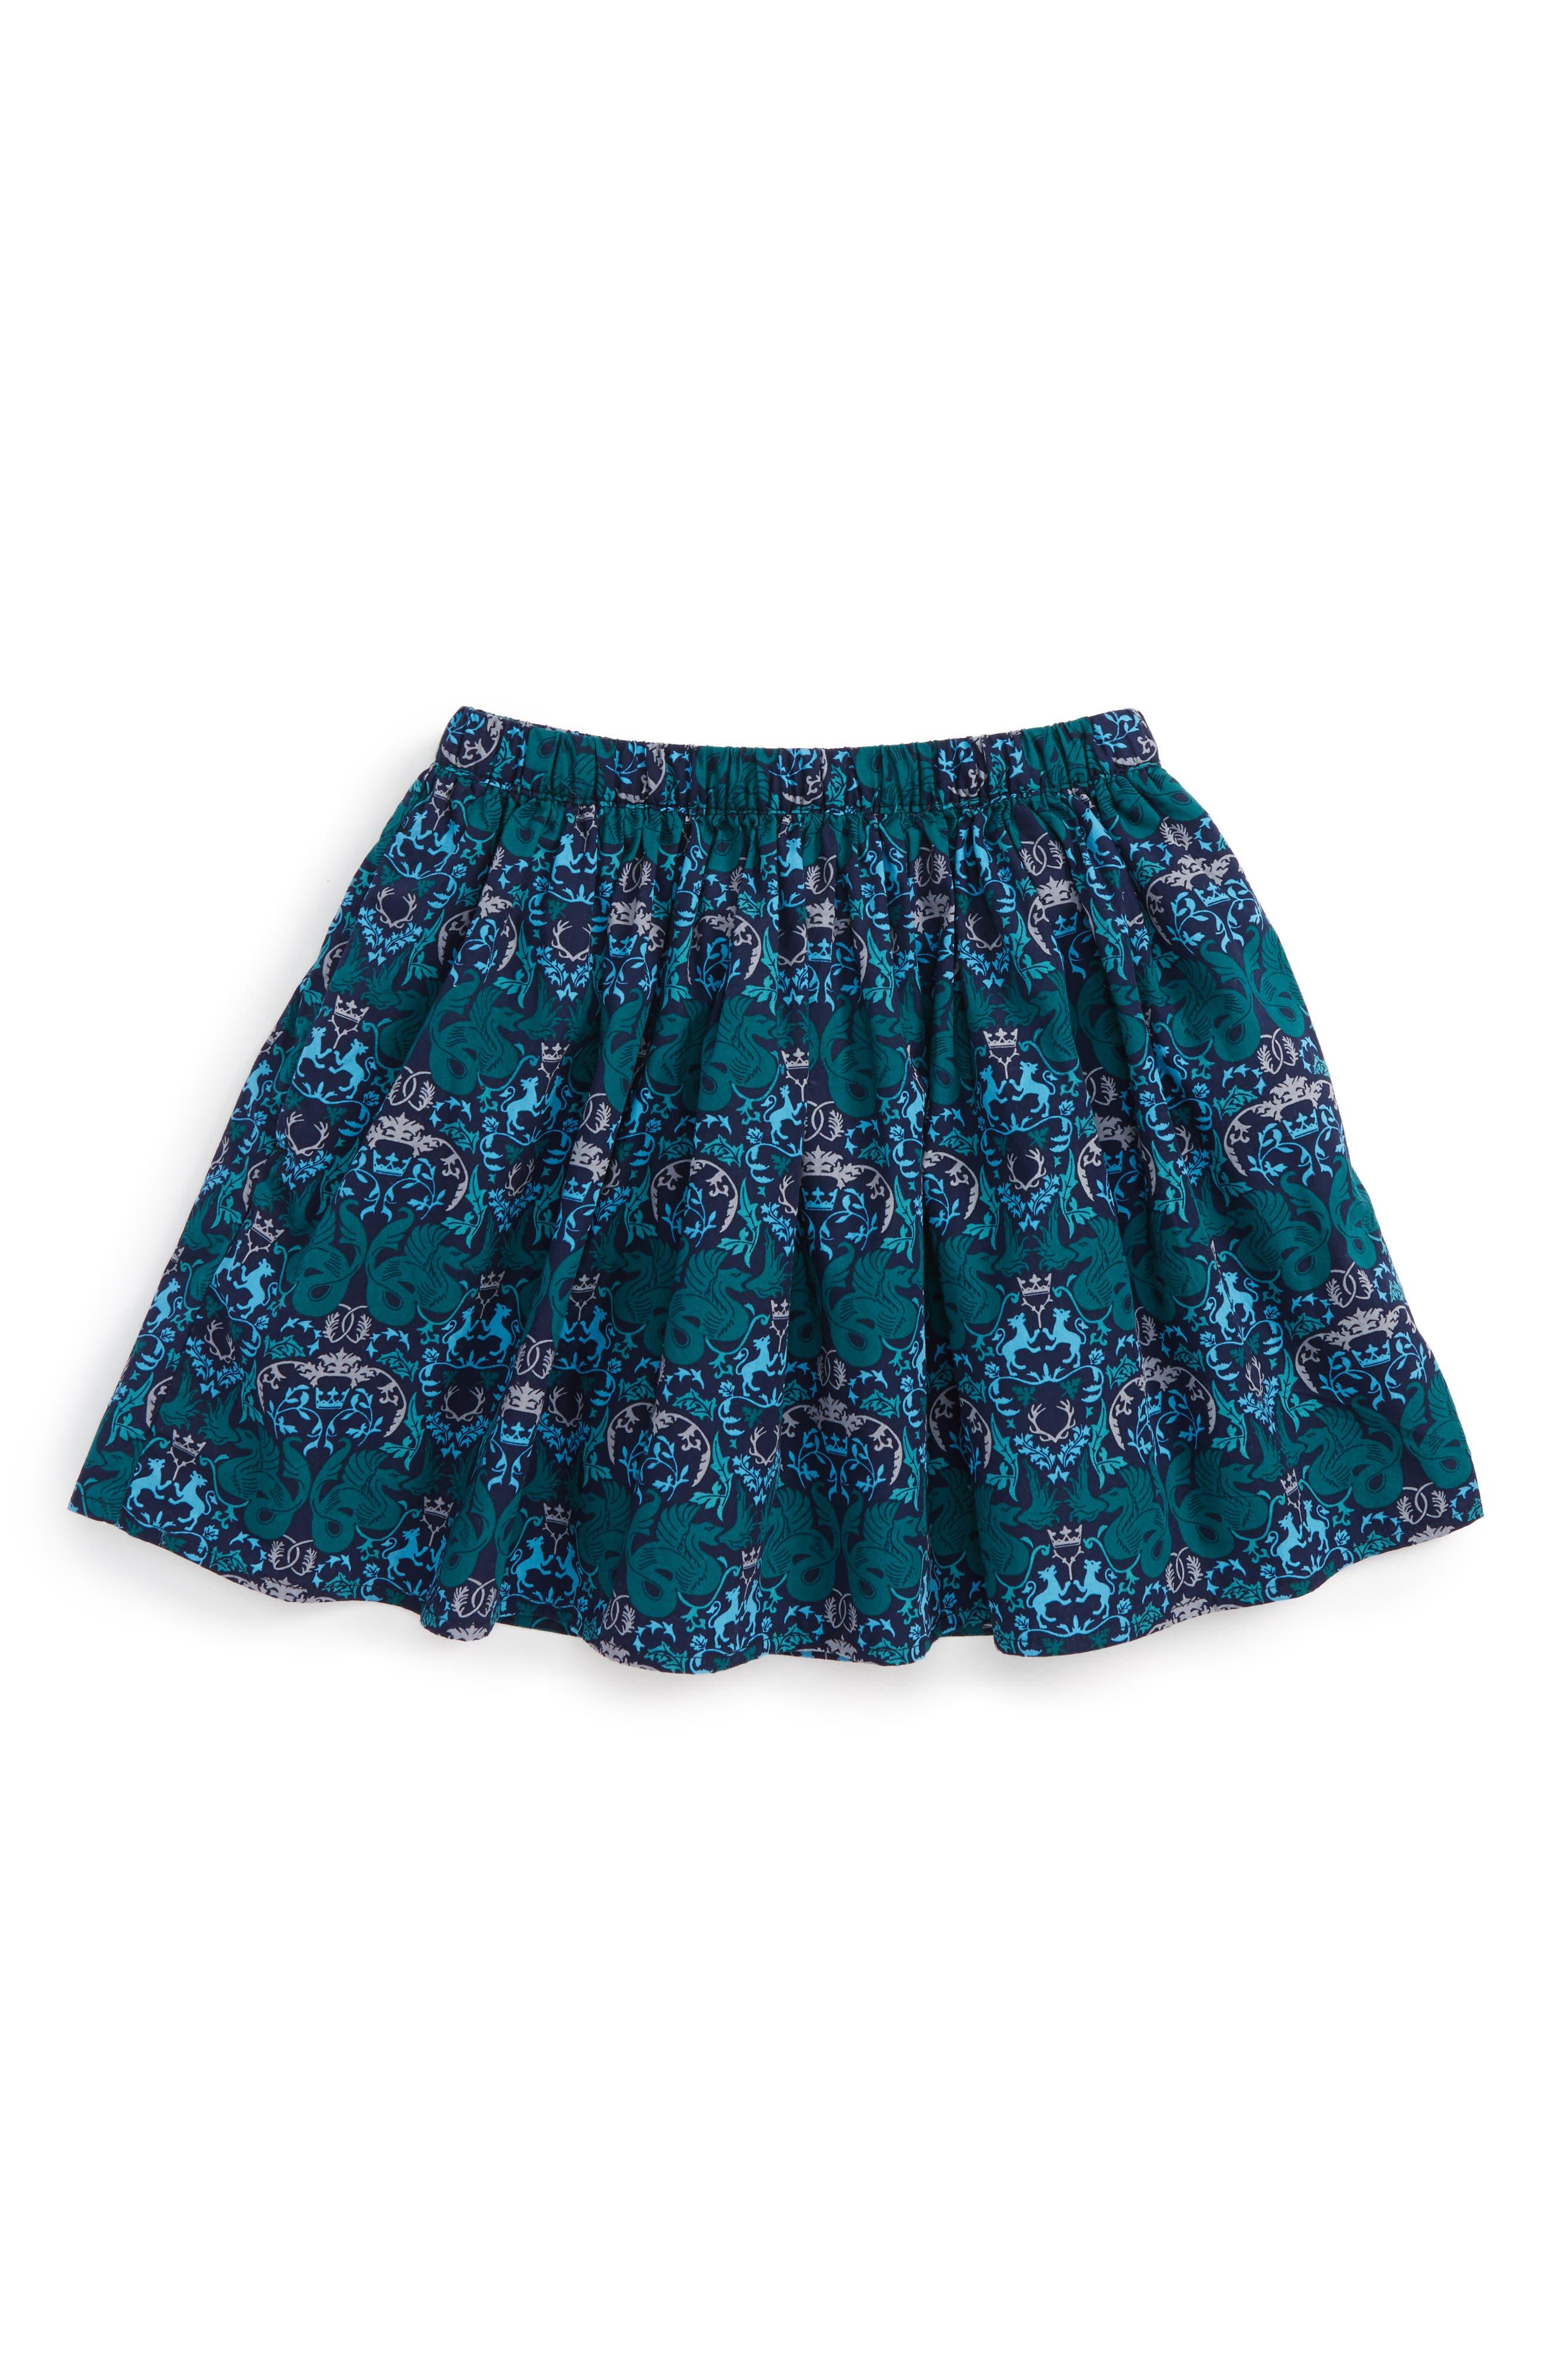 Cadha Print Twirl Skirt,                         Main,                         color, 411